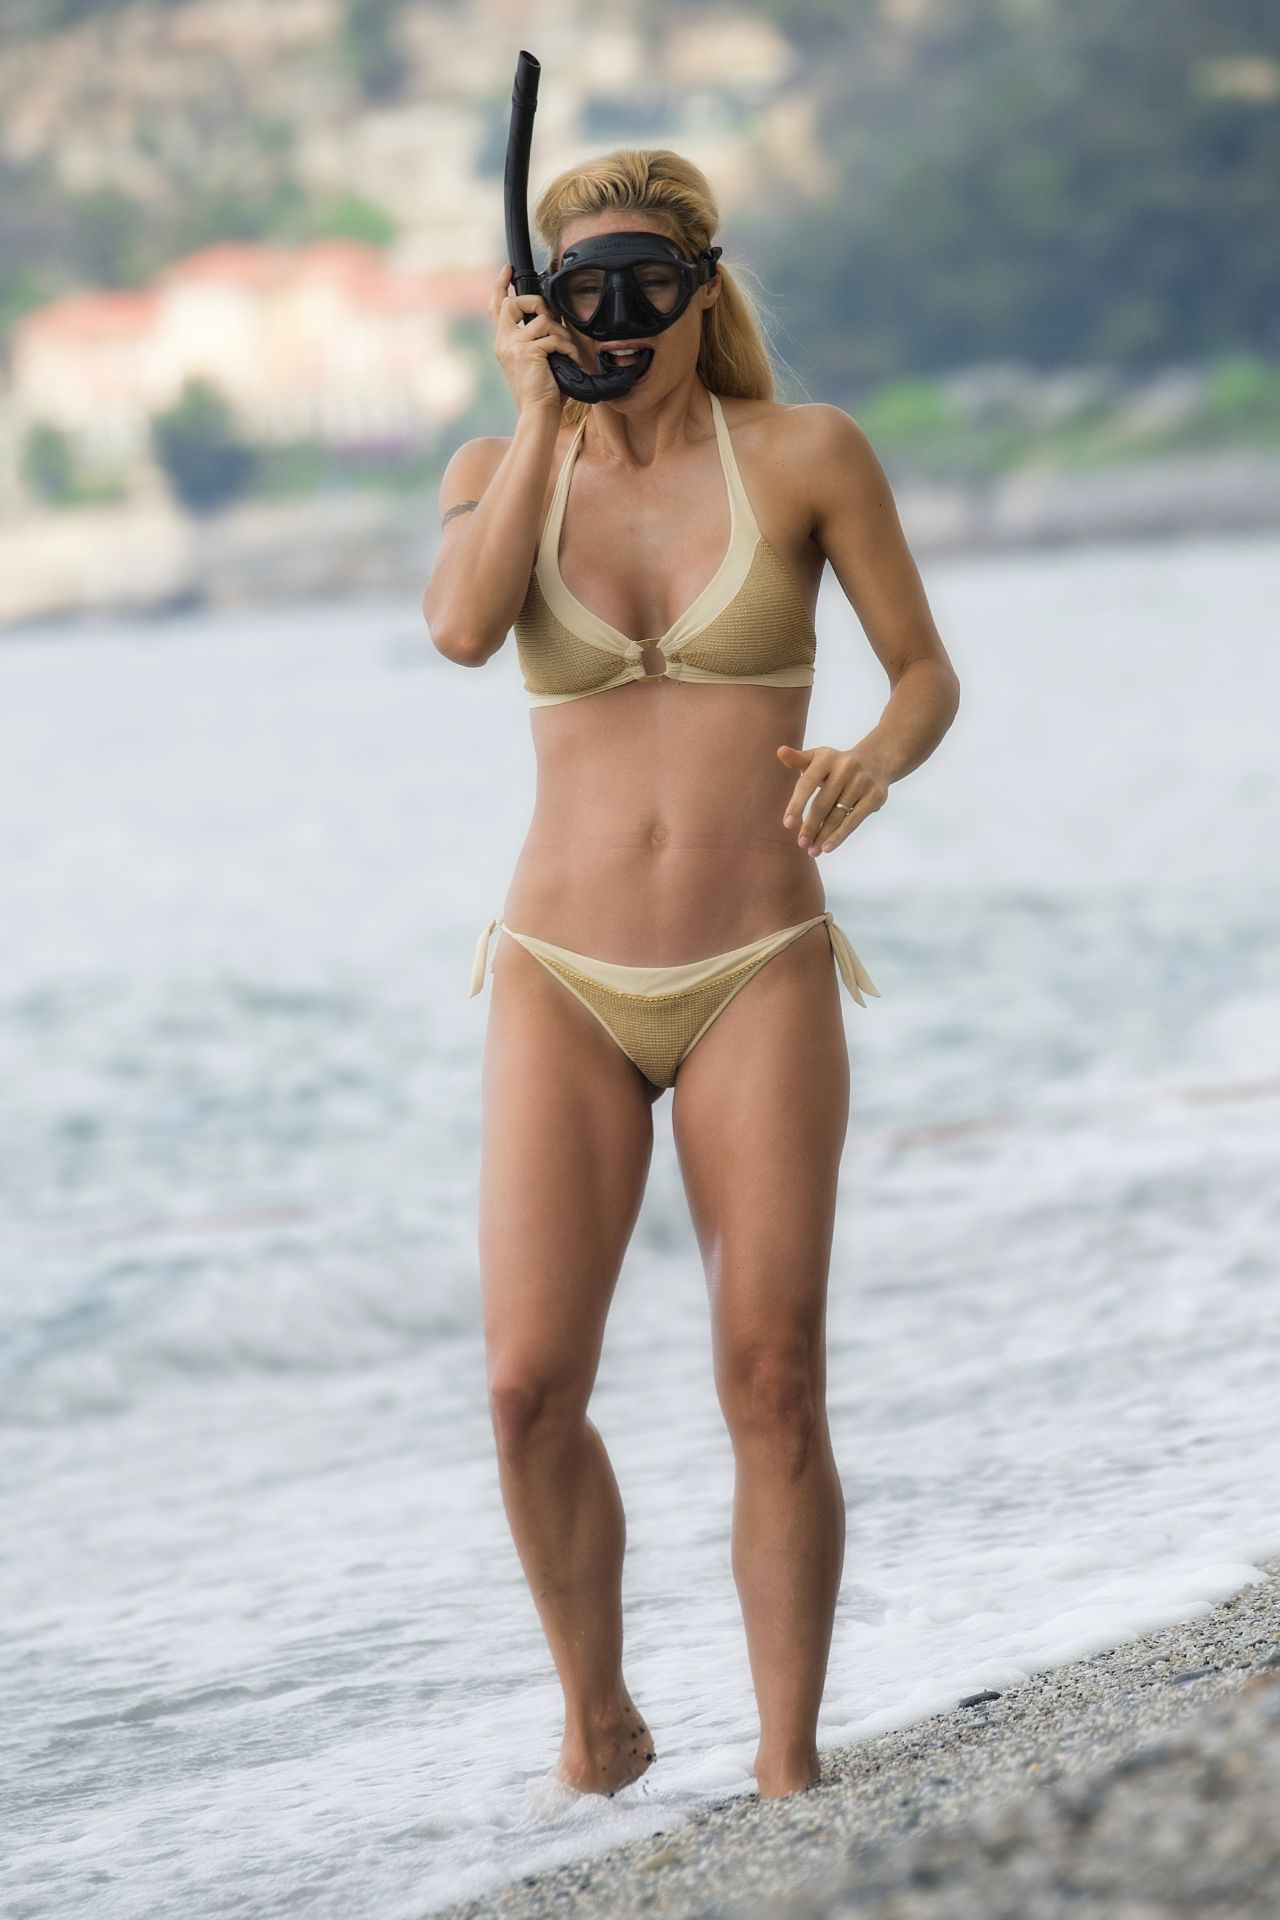 Michelle Hunziker In Bikini Varigotti In Italy 06 22 2017